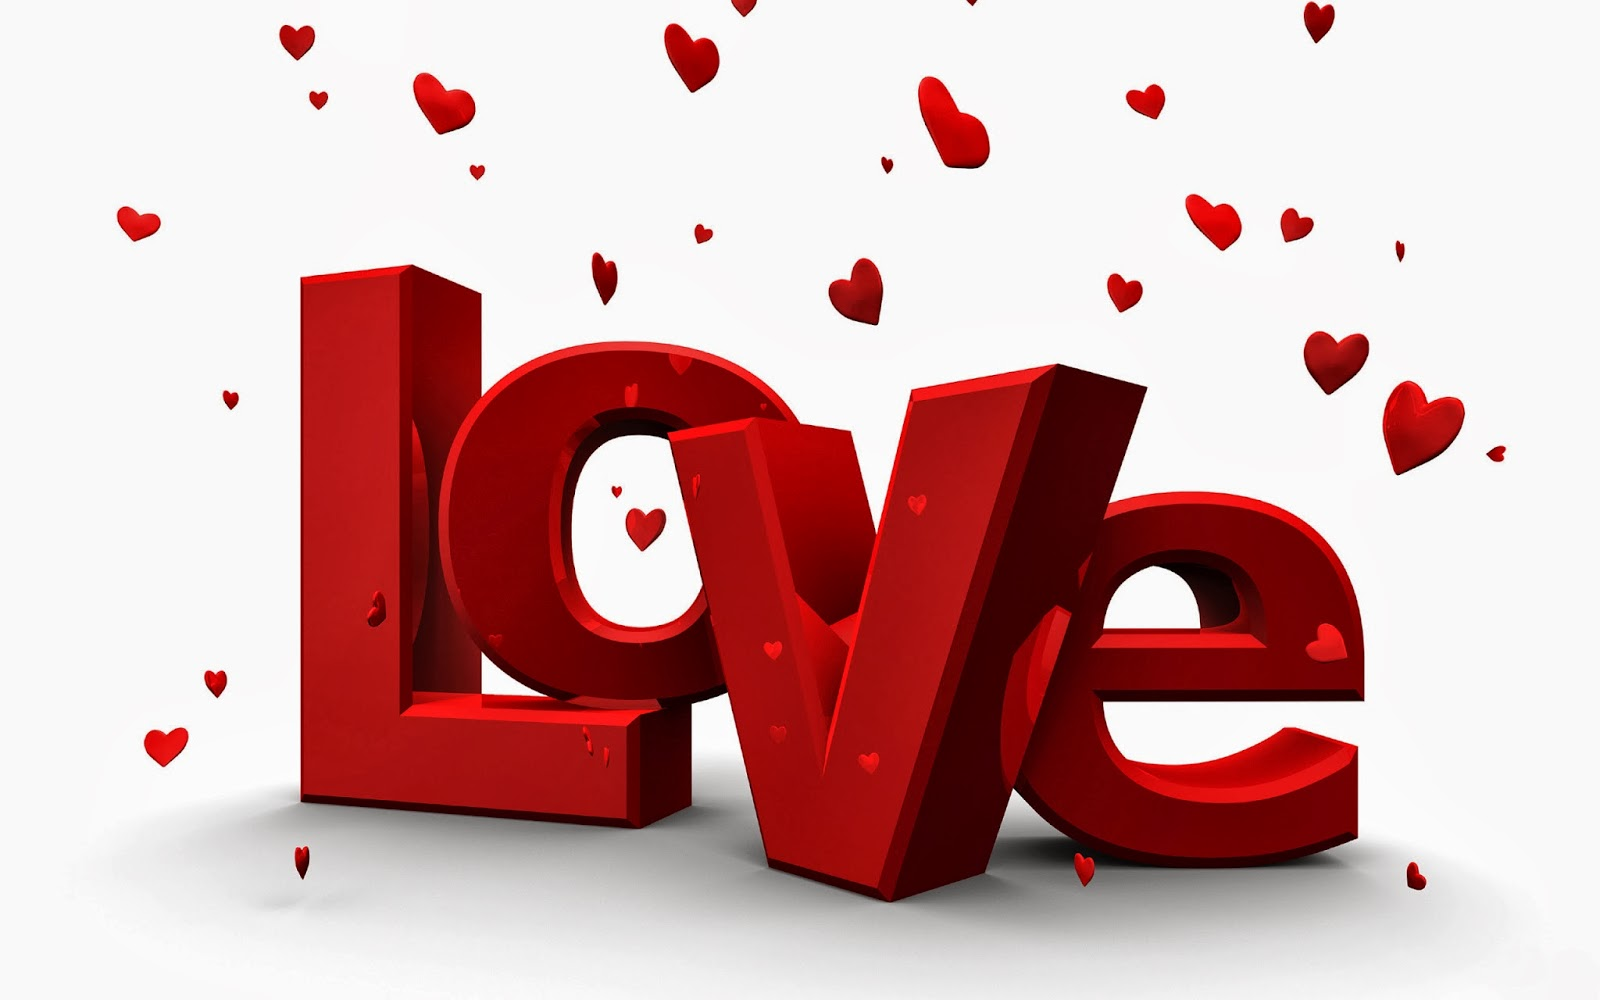 Imágenes Hilandy: Fondo de Pantalla Dia de san valentin love ...